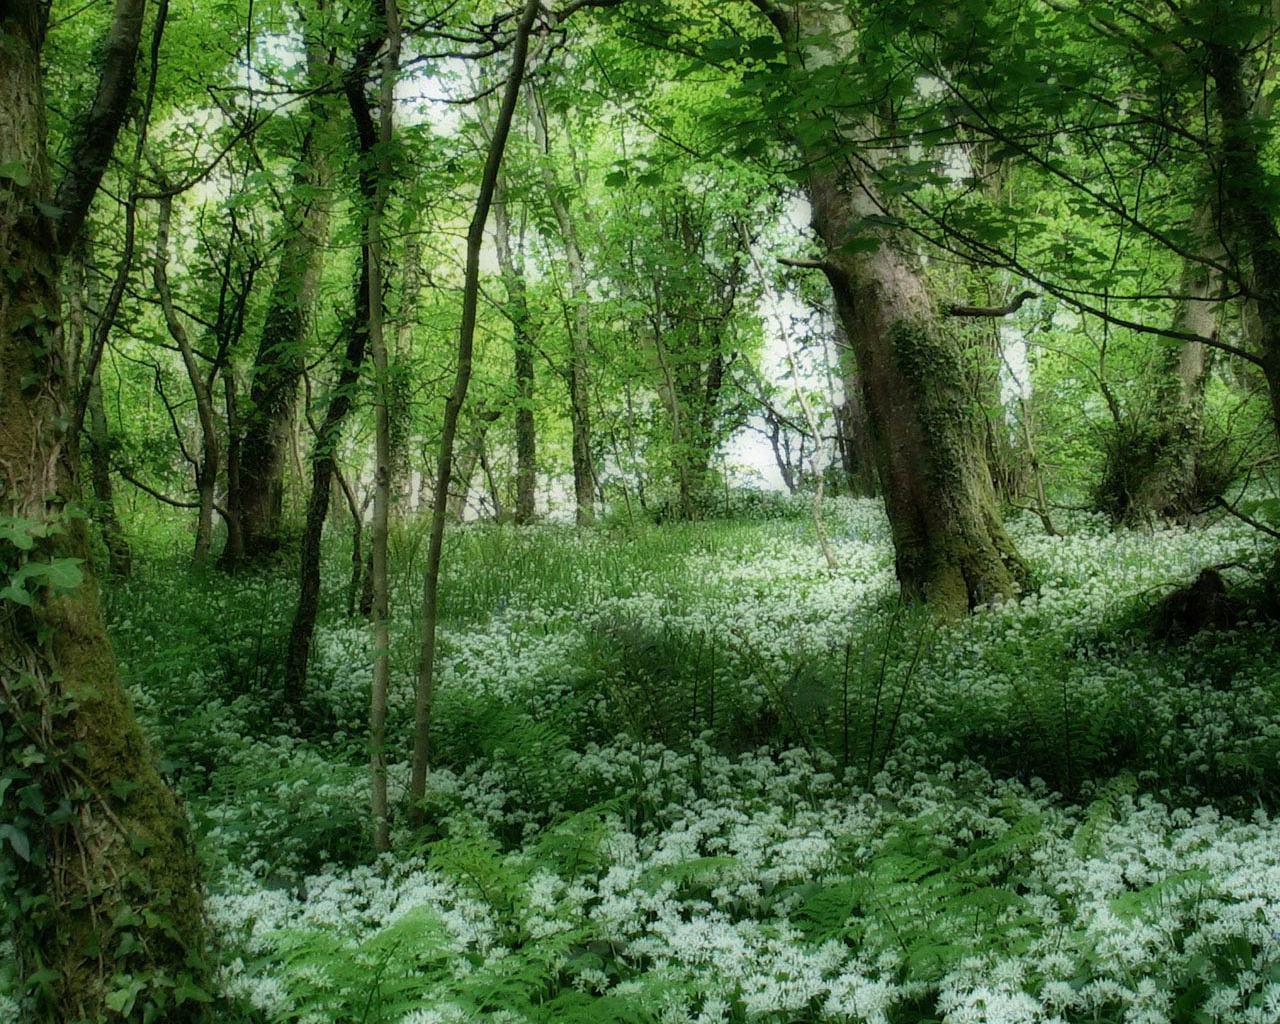 http://1.bp.blogspot.com/-6P3Rc37W6_Q/T77IJYAmU0I/AAAAAAAAE10/tZ0kiL95iyg/s1600/Green-Forest-Wallpaper-green-20036573-1280-1024.jpg